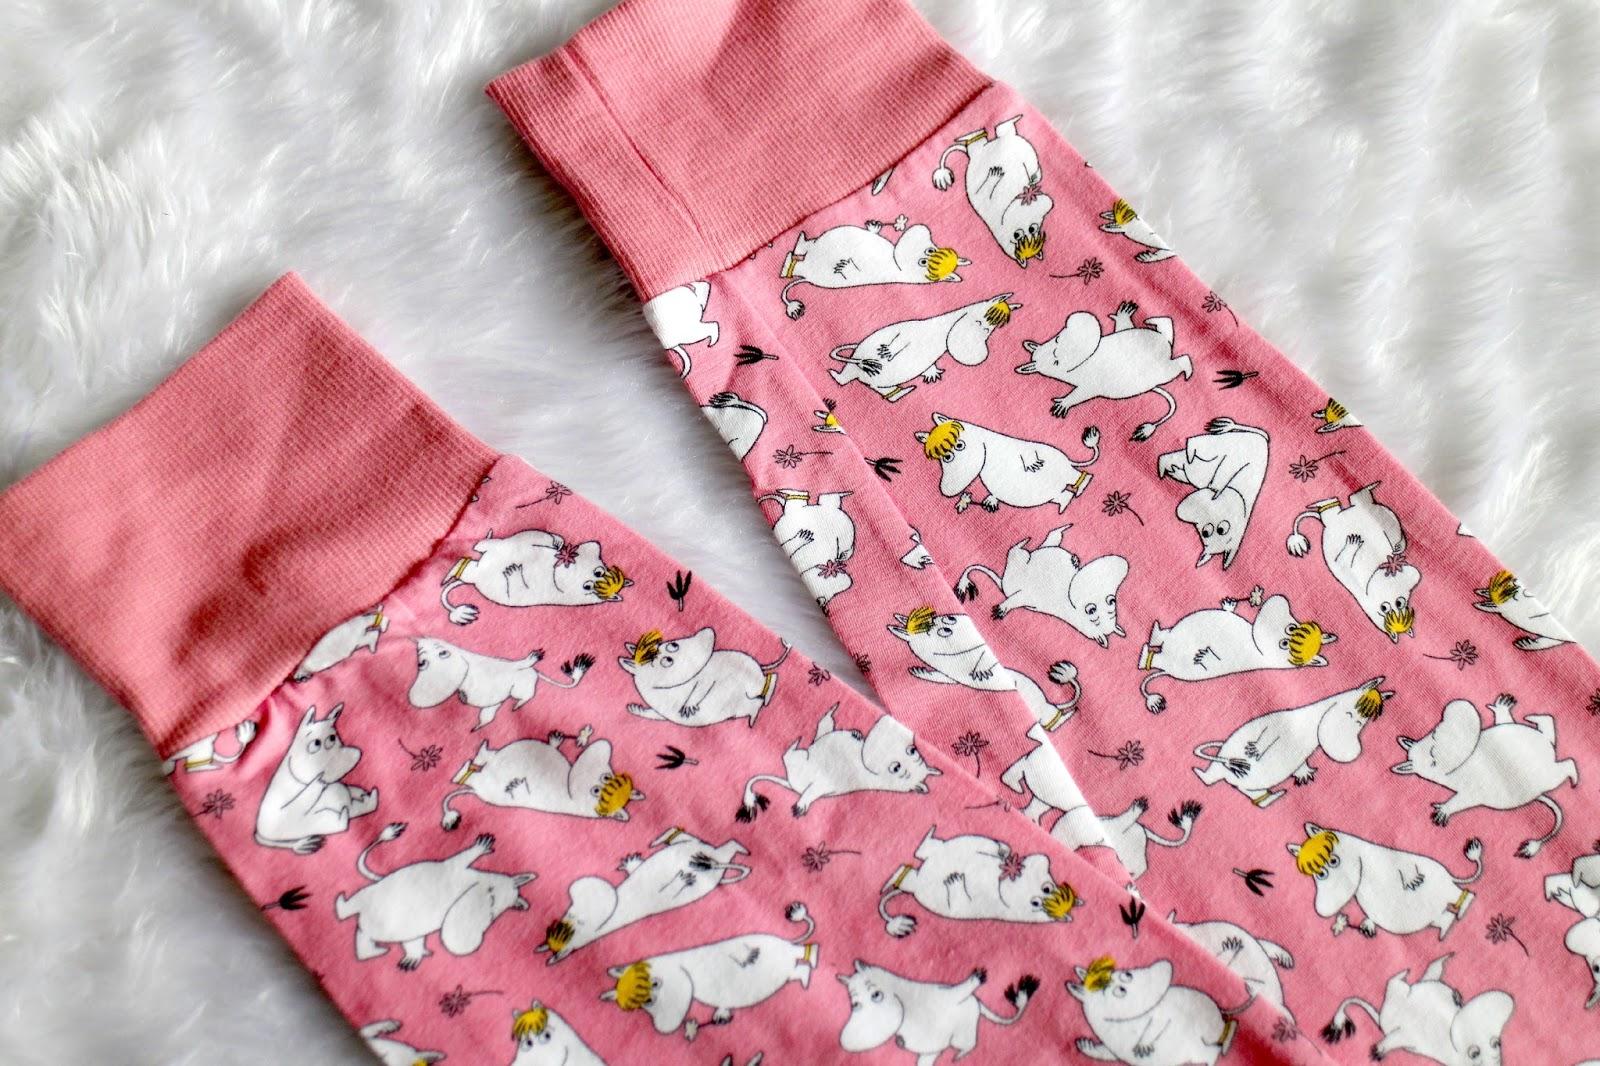 Moomin Pyjamas George at Asda